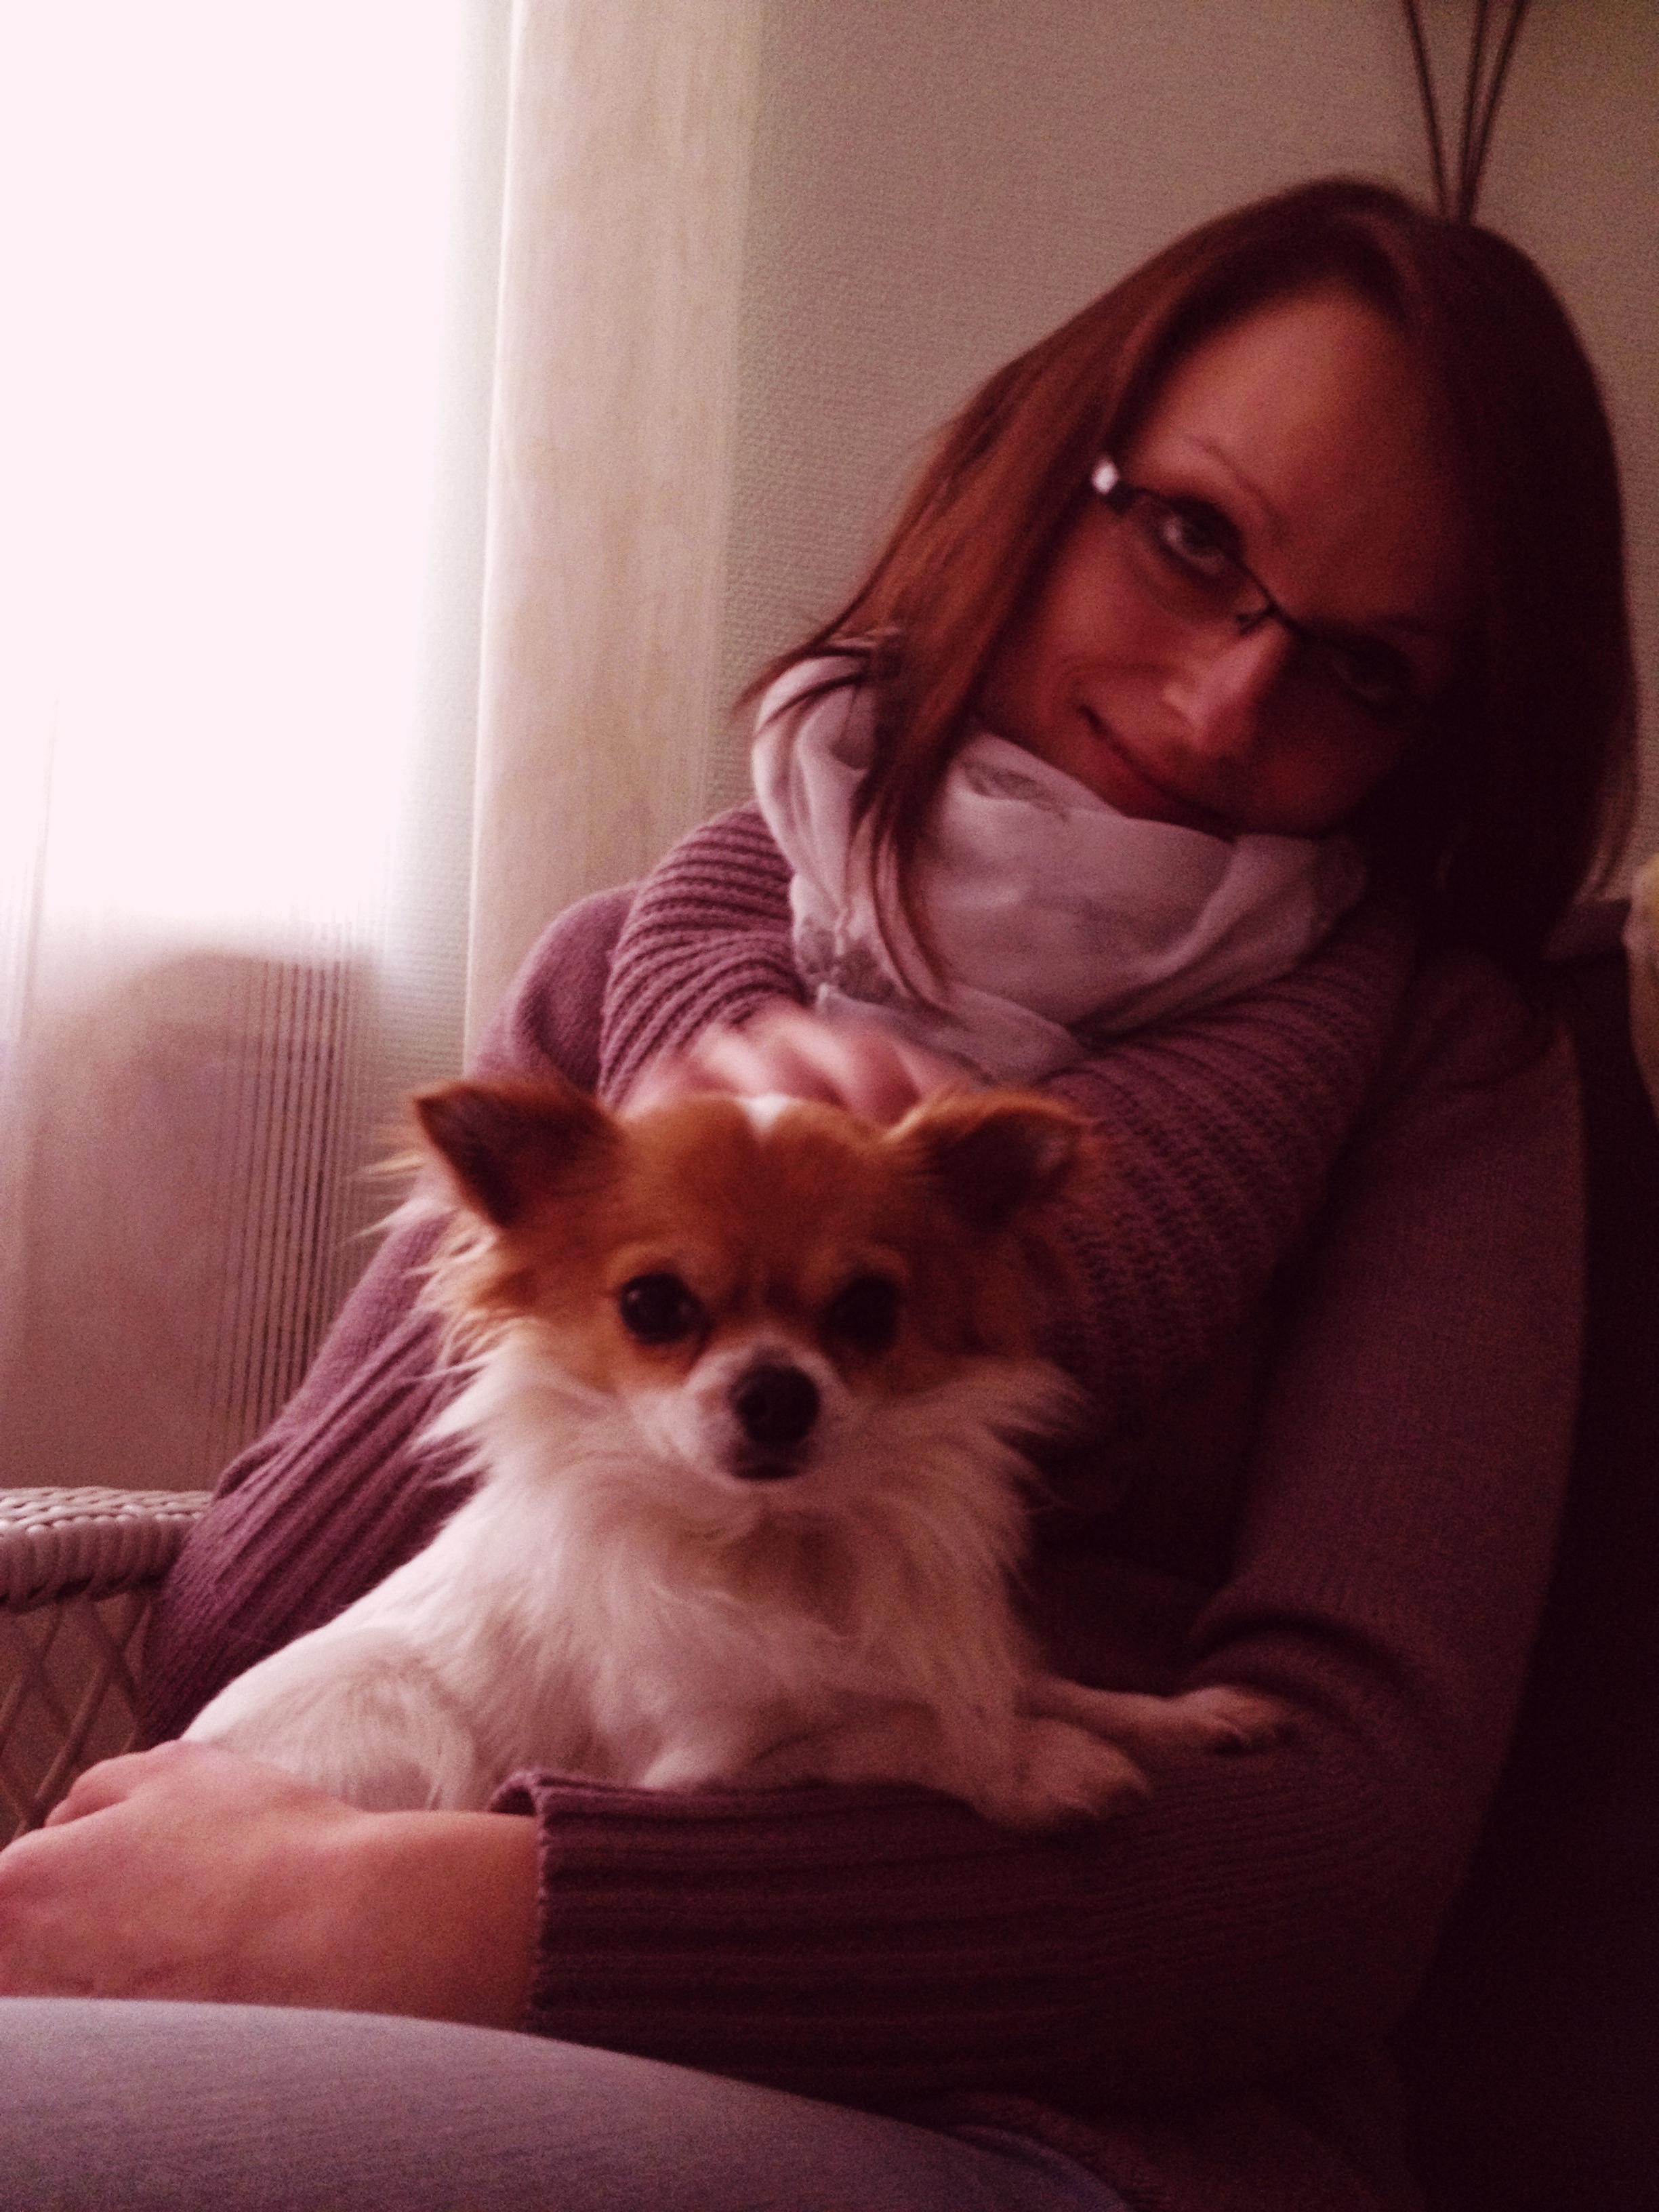 magdalena Baszton Portrait mit Emilio